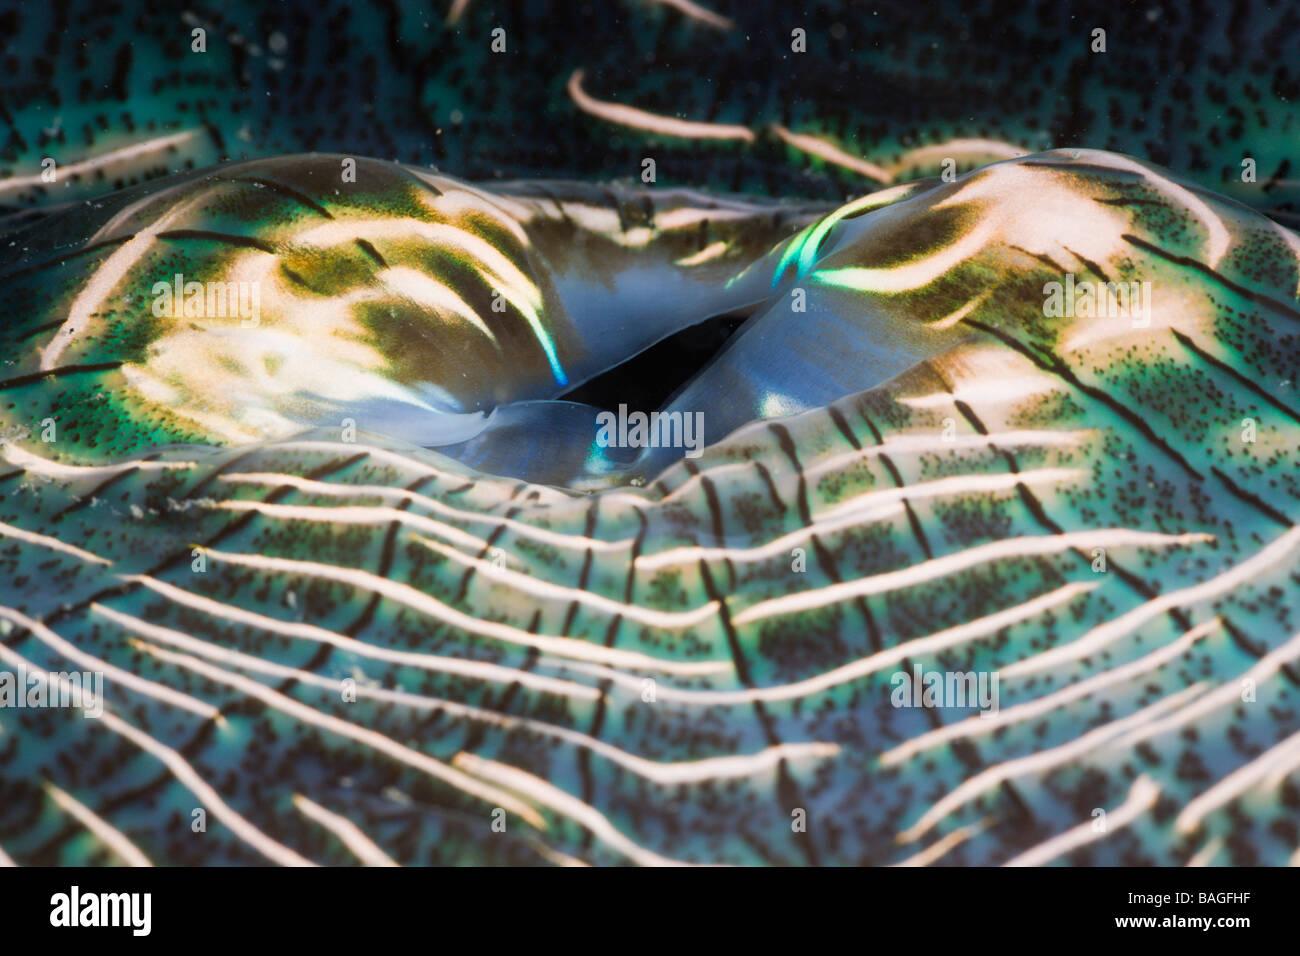 Manteau irisé de bénitiers Tridacna Squamosa Micronésie Palau Photo Stock